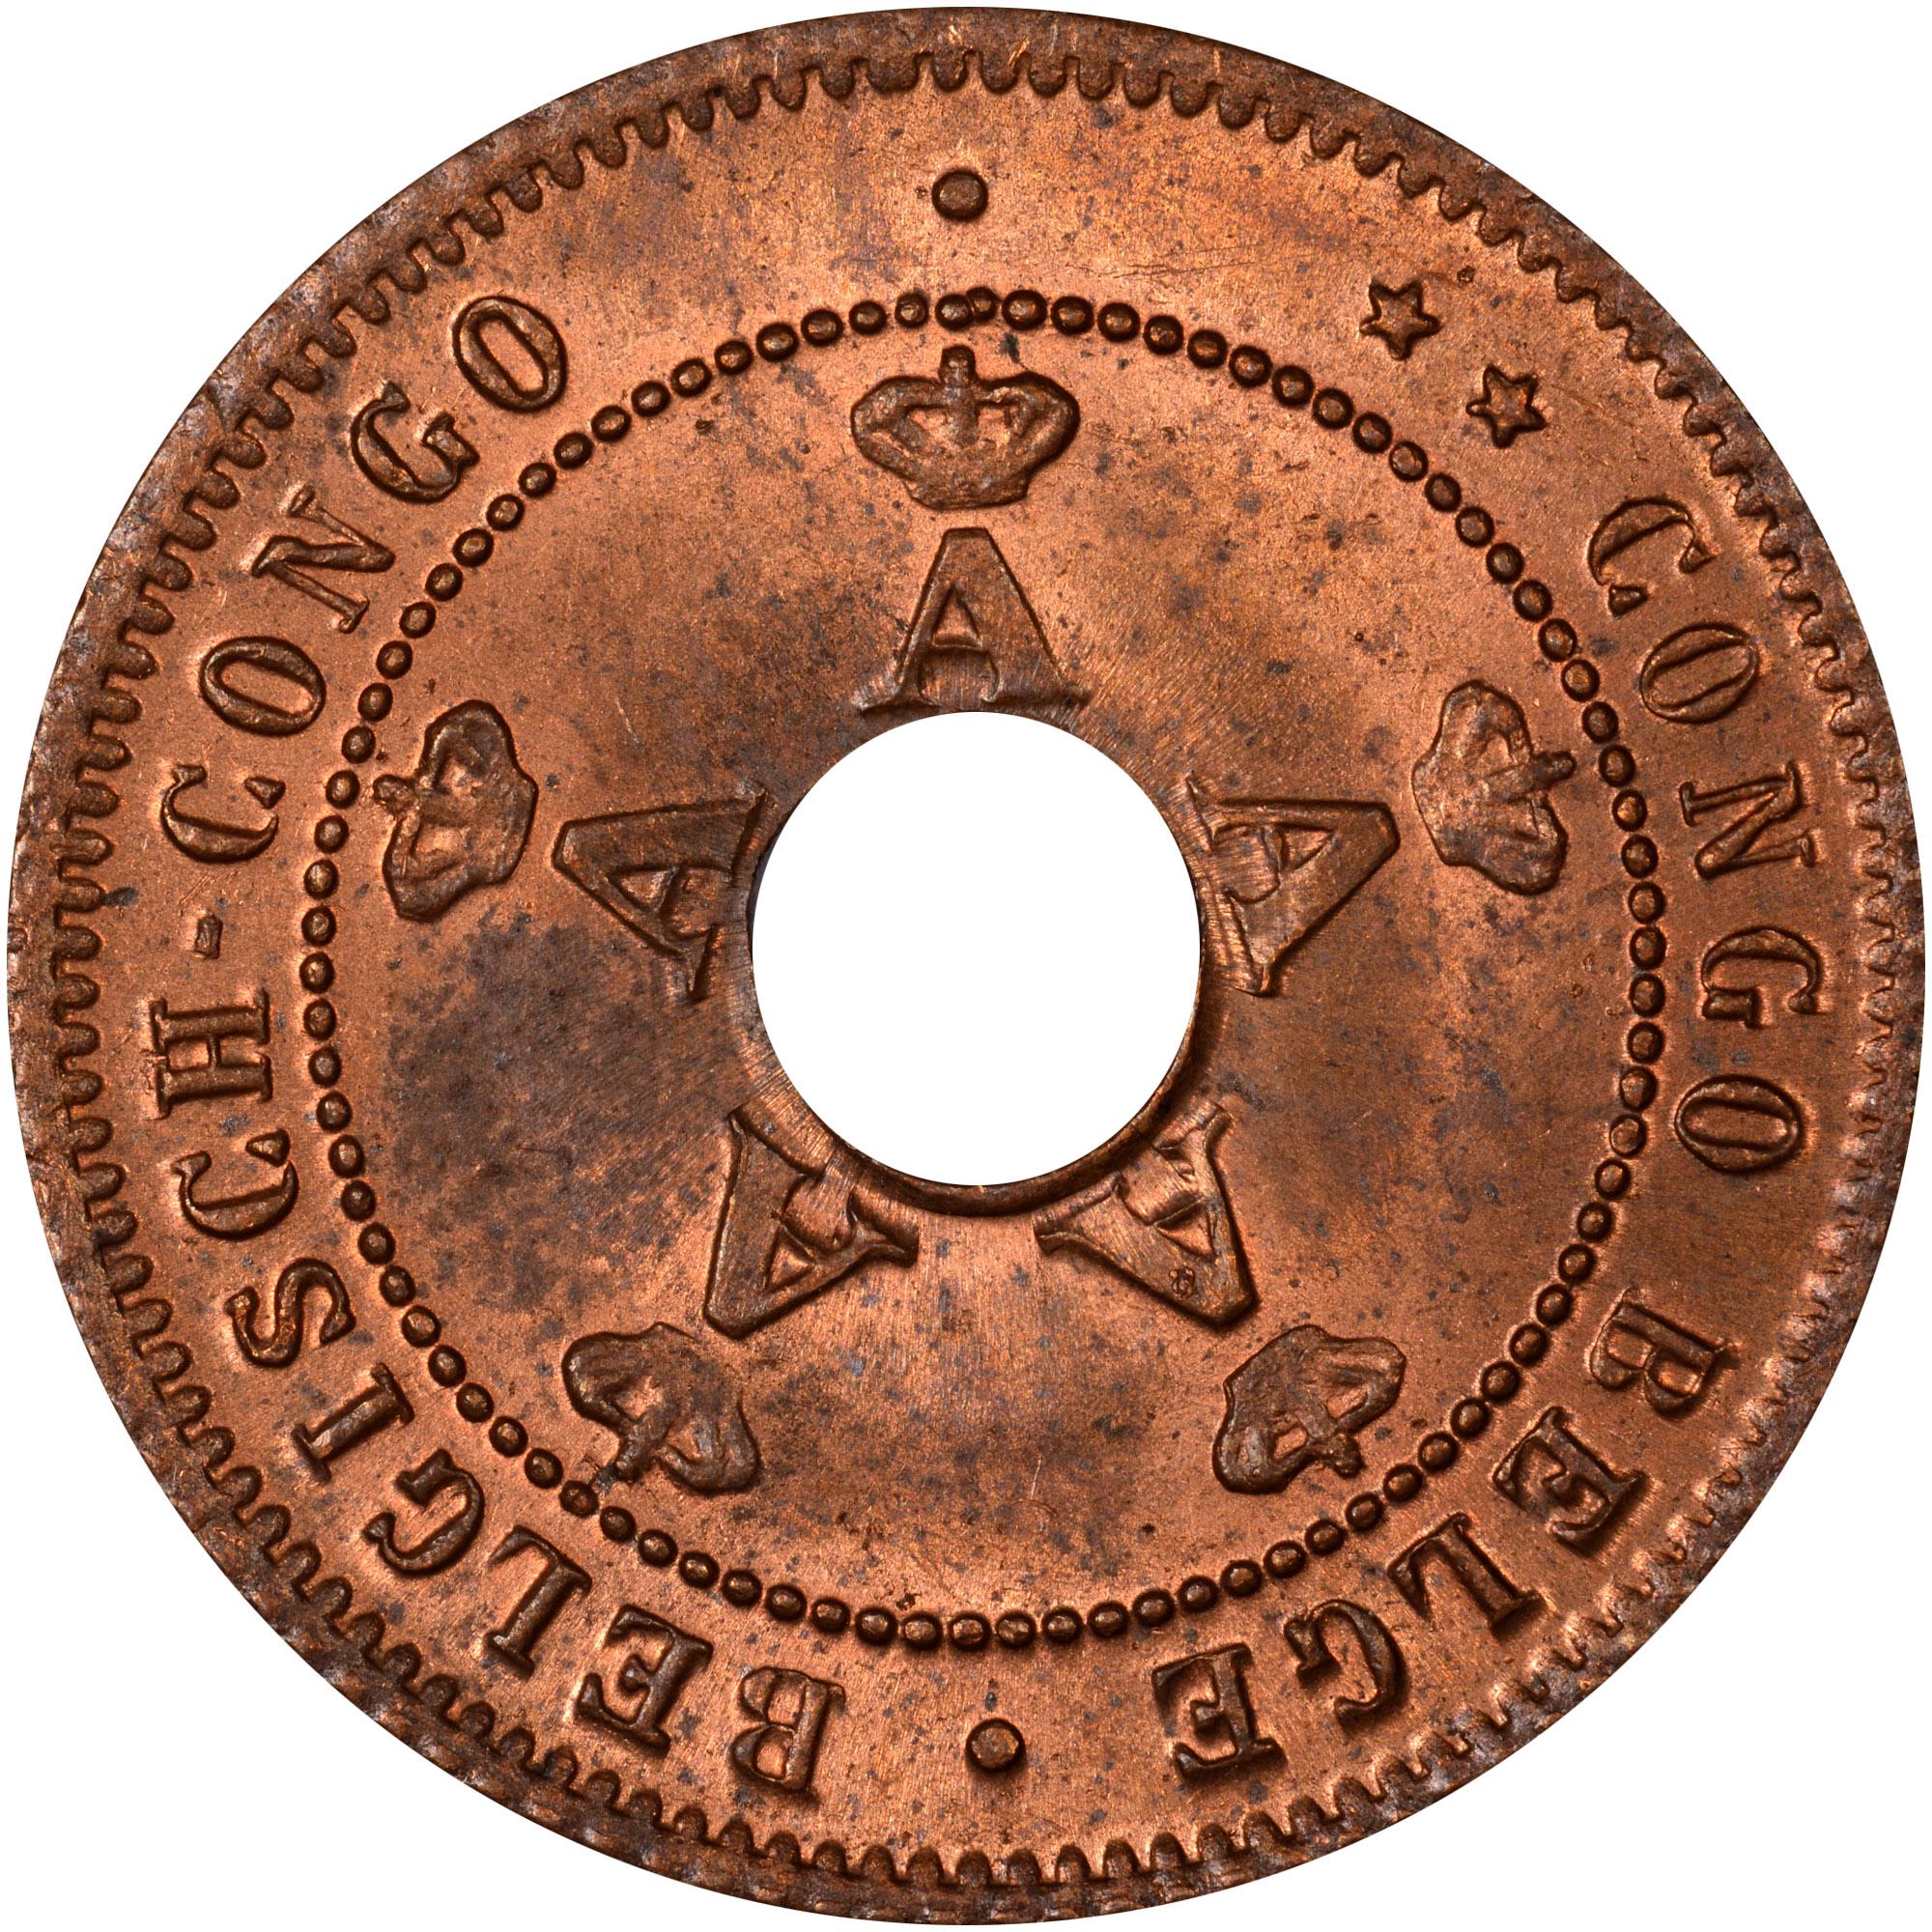 1910-1919 Belgian Congo Centime obverse